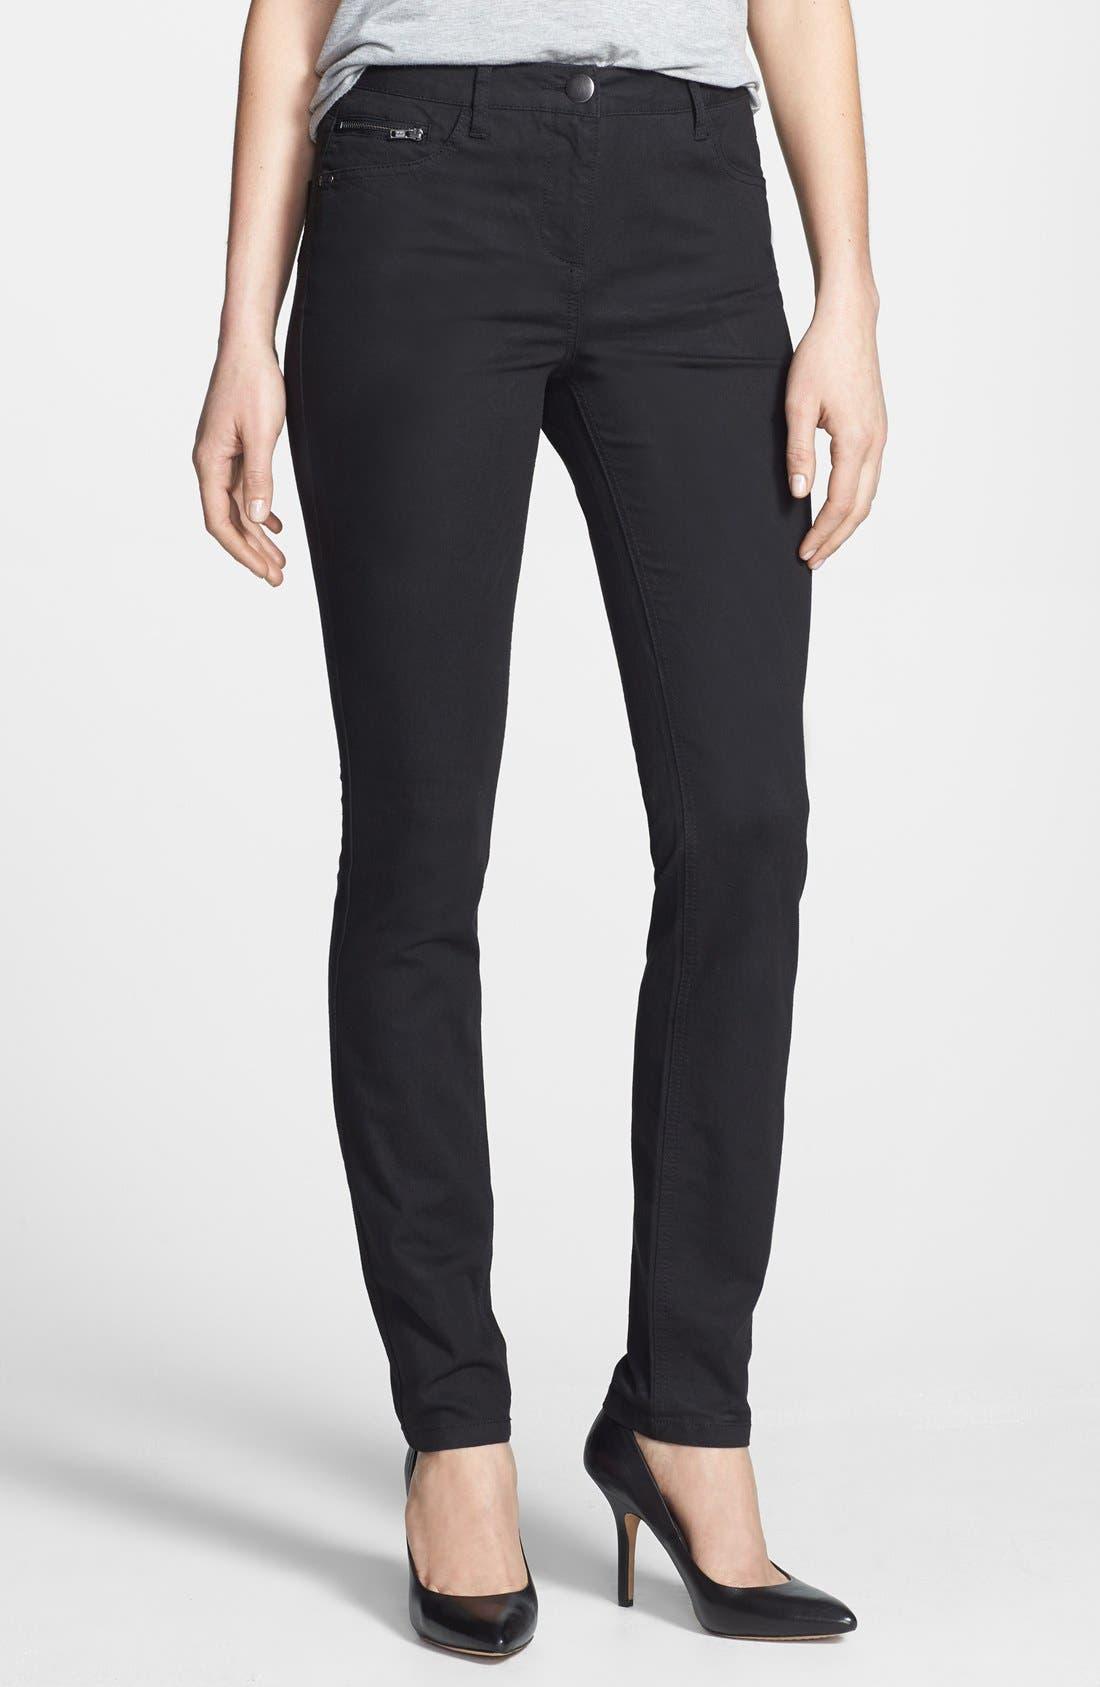 Alternate Image 1 Selected - Wallis Stretch Skinny Jeans (Black)